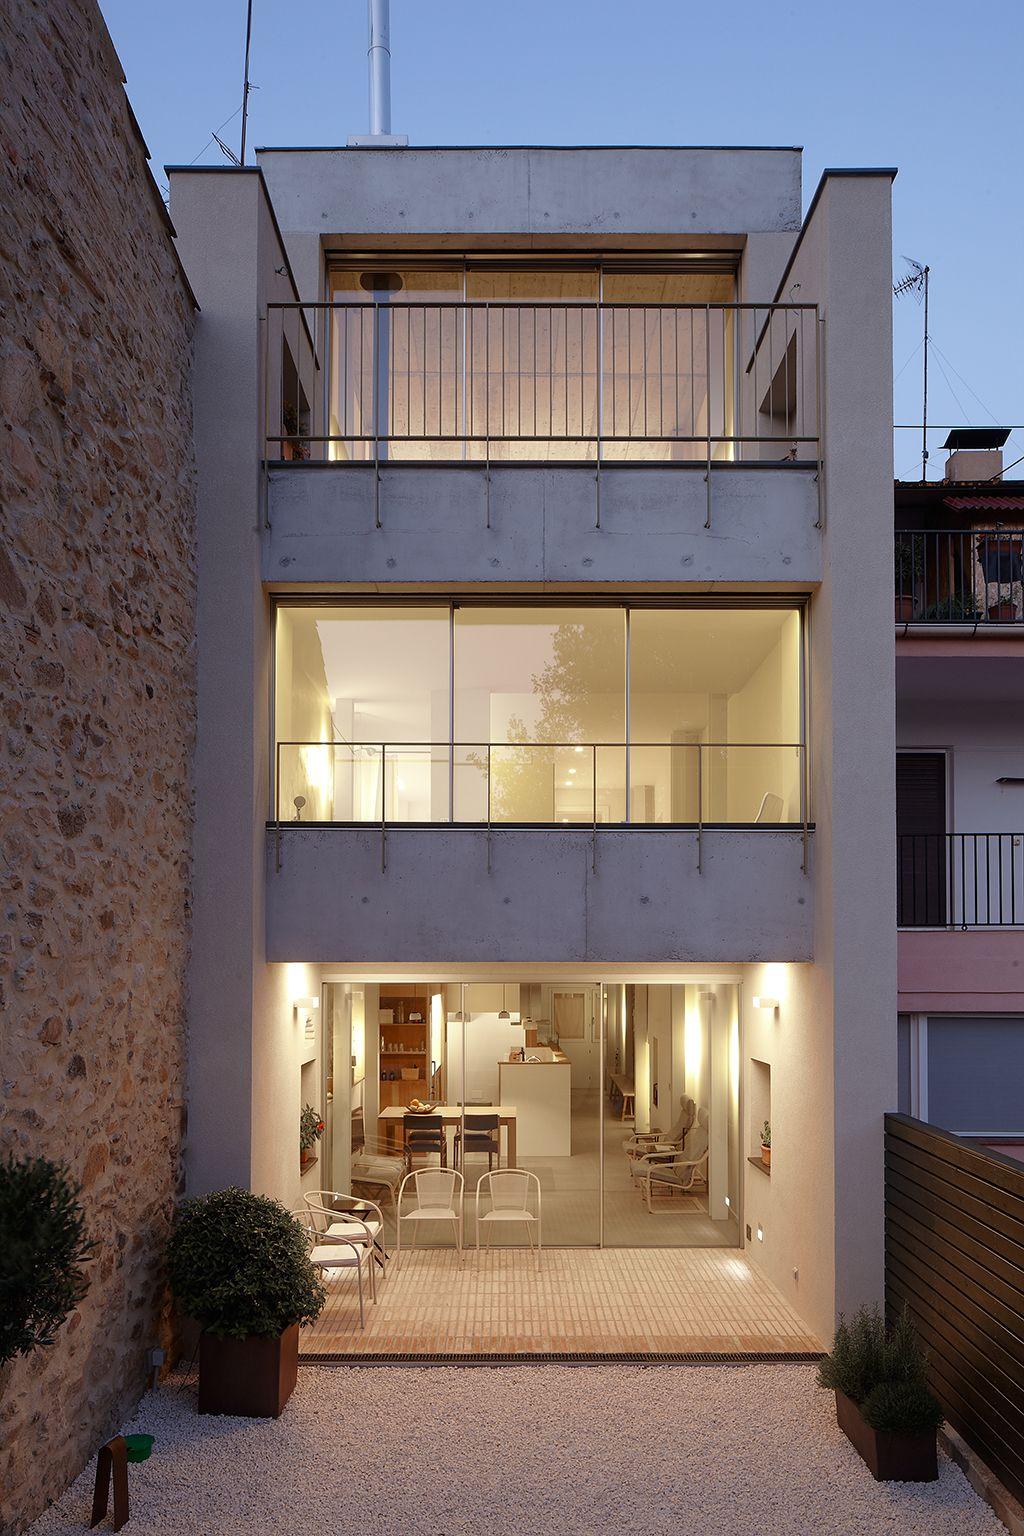 Casa entre mitgeres e plantalech construccions met l for Fachadas de casas modernas entre medianeras